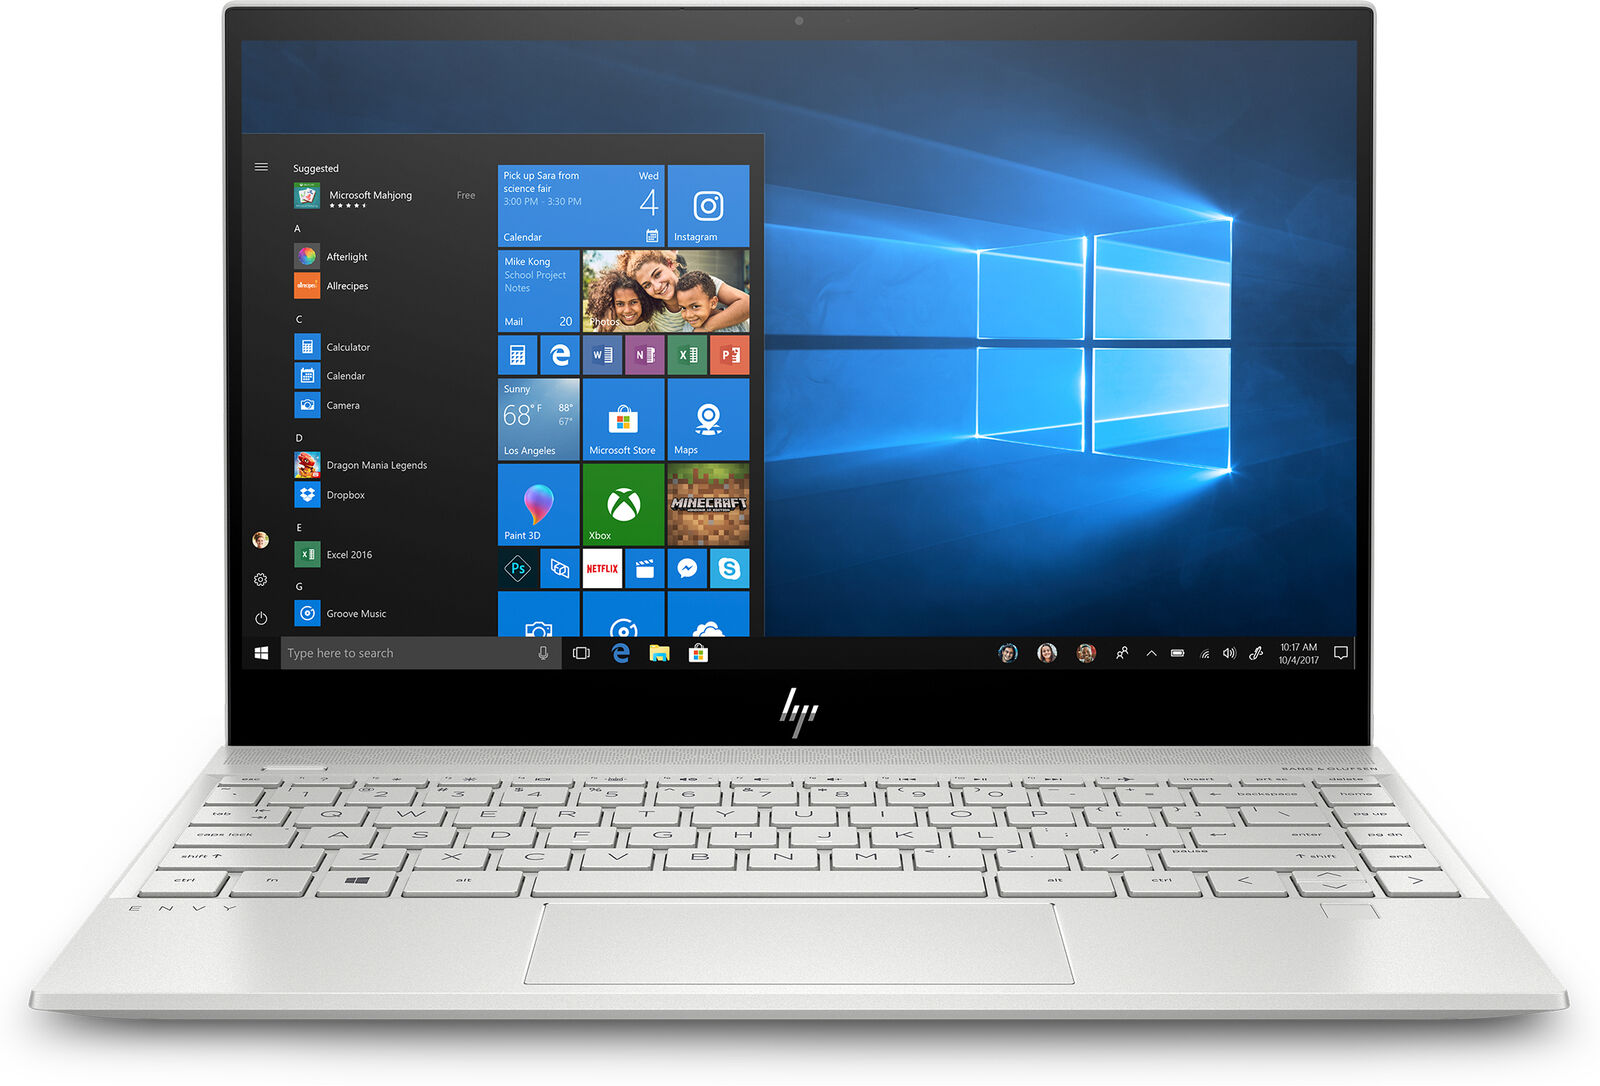 HP ENVY 13.3 Inch Full HD Intel Core i5 8GB RAM 256GB SSD 1